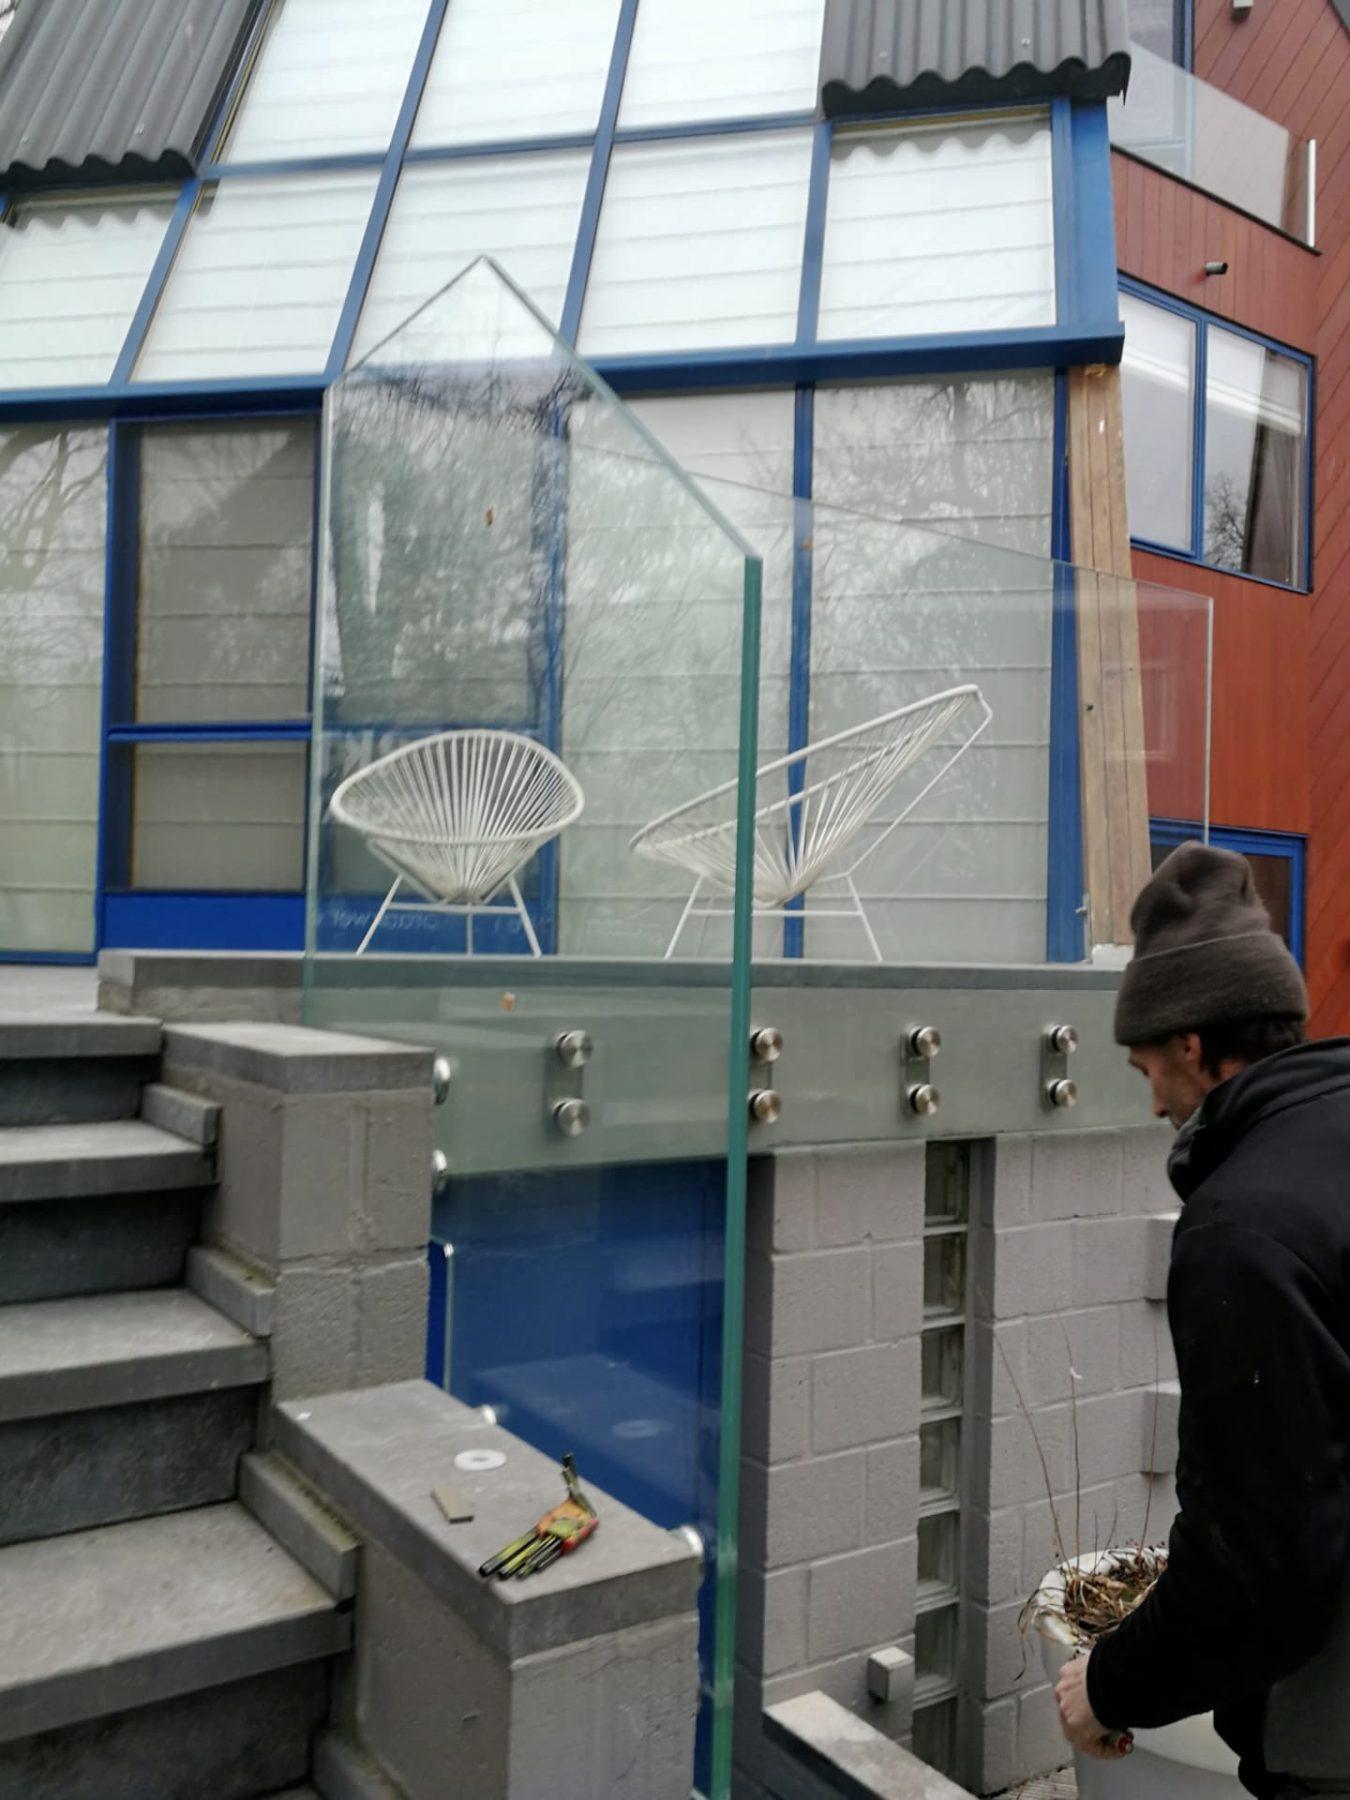 https://allglas.be/wp-content/uploads/2020/02/all-glas-walschaerts-bonheiden-glas-balustrade-buiten-08.jpeg